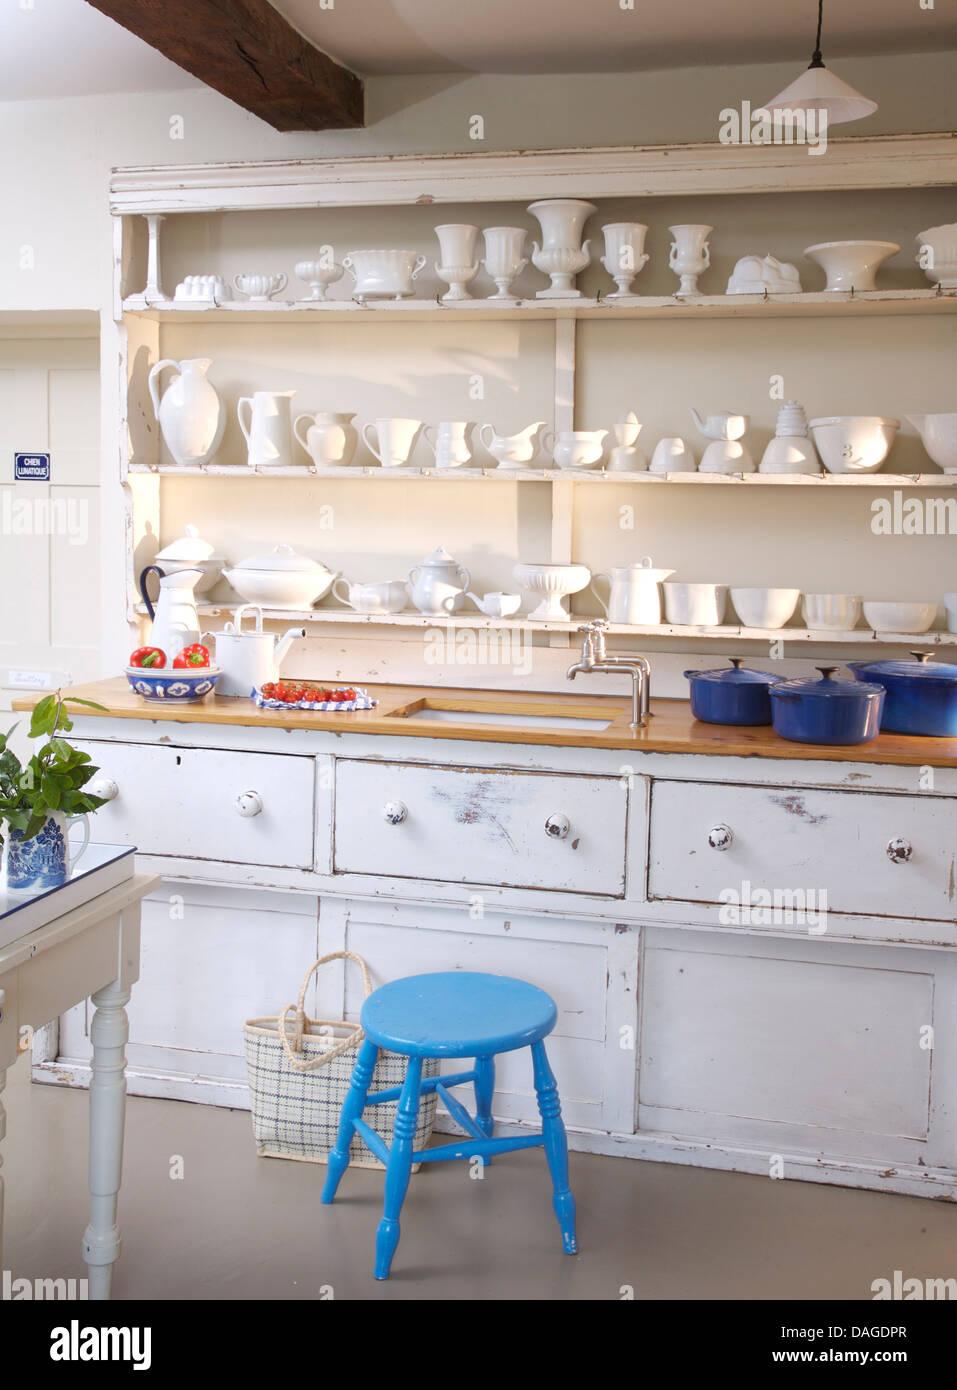 Shelves Above Kitchen Sink Stock Photos & Shelves Above Kitchen ...